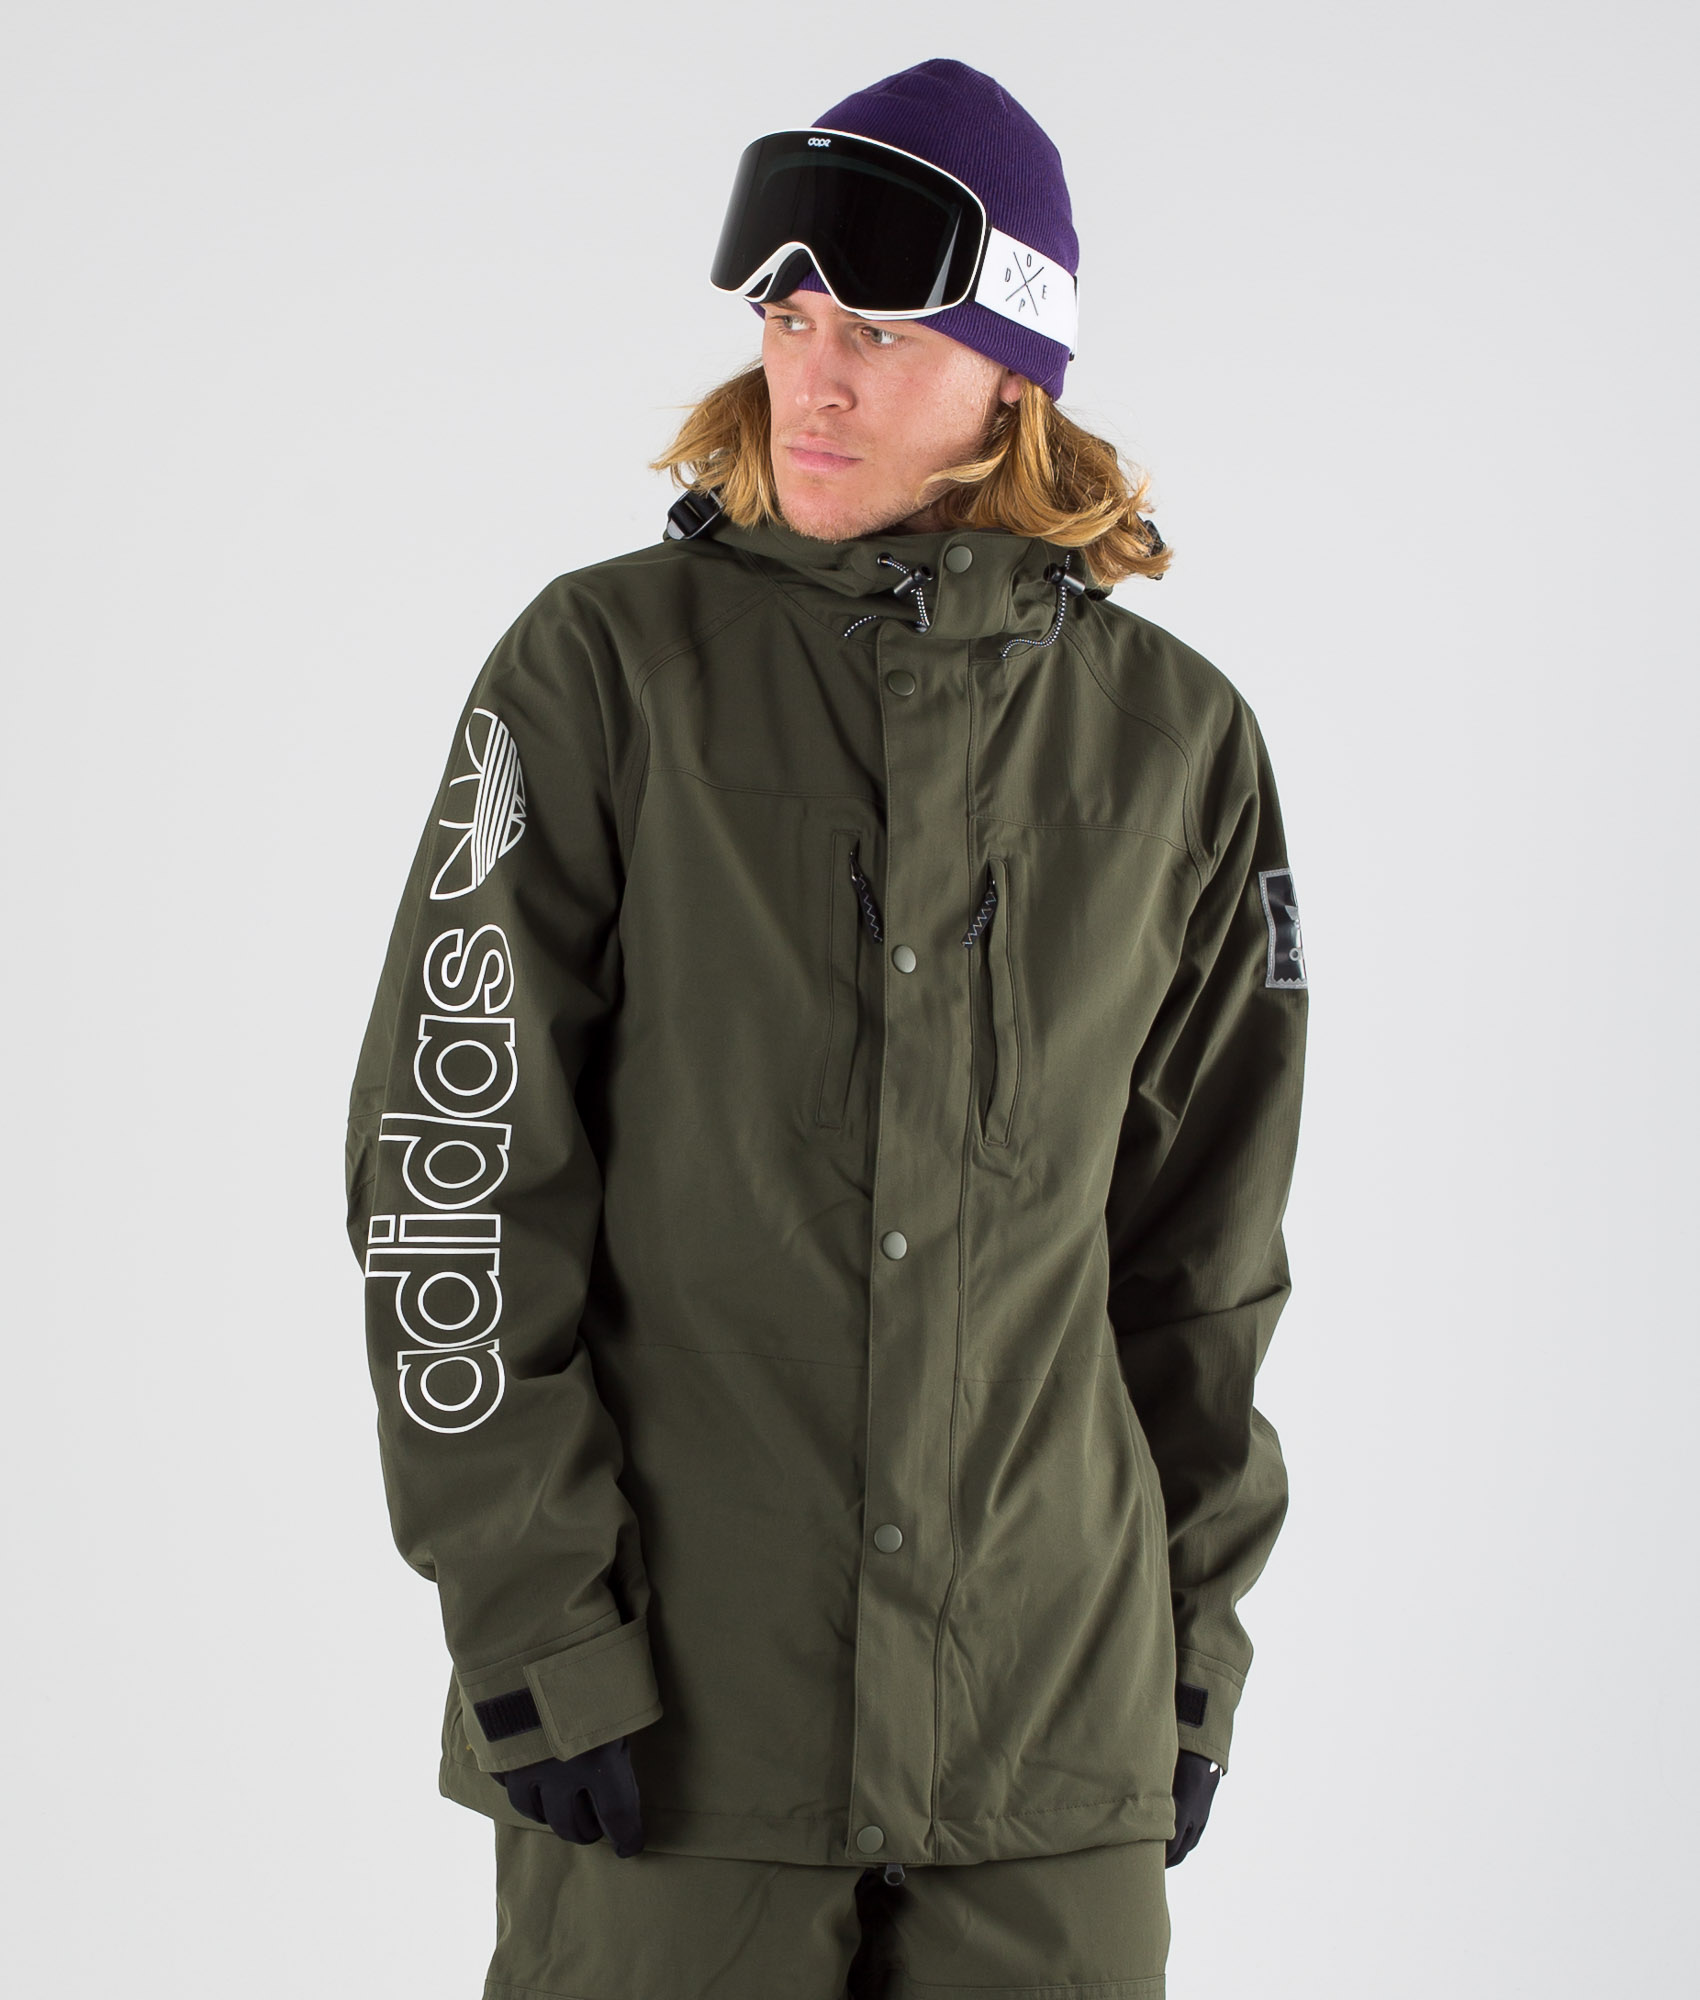 Adidas Snowboarding Herren Ski Snowboardjacke Utility